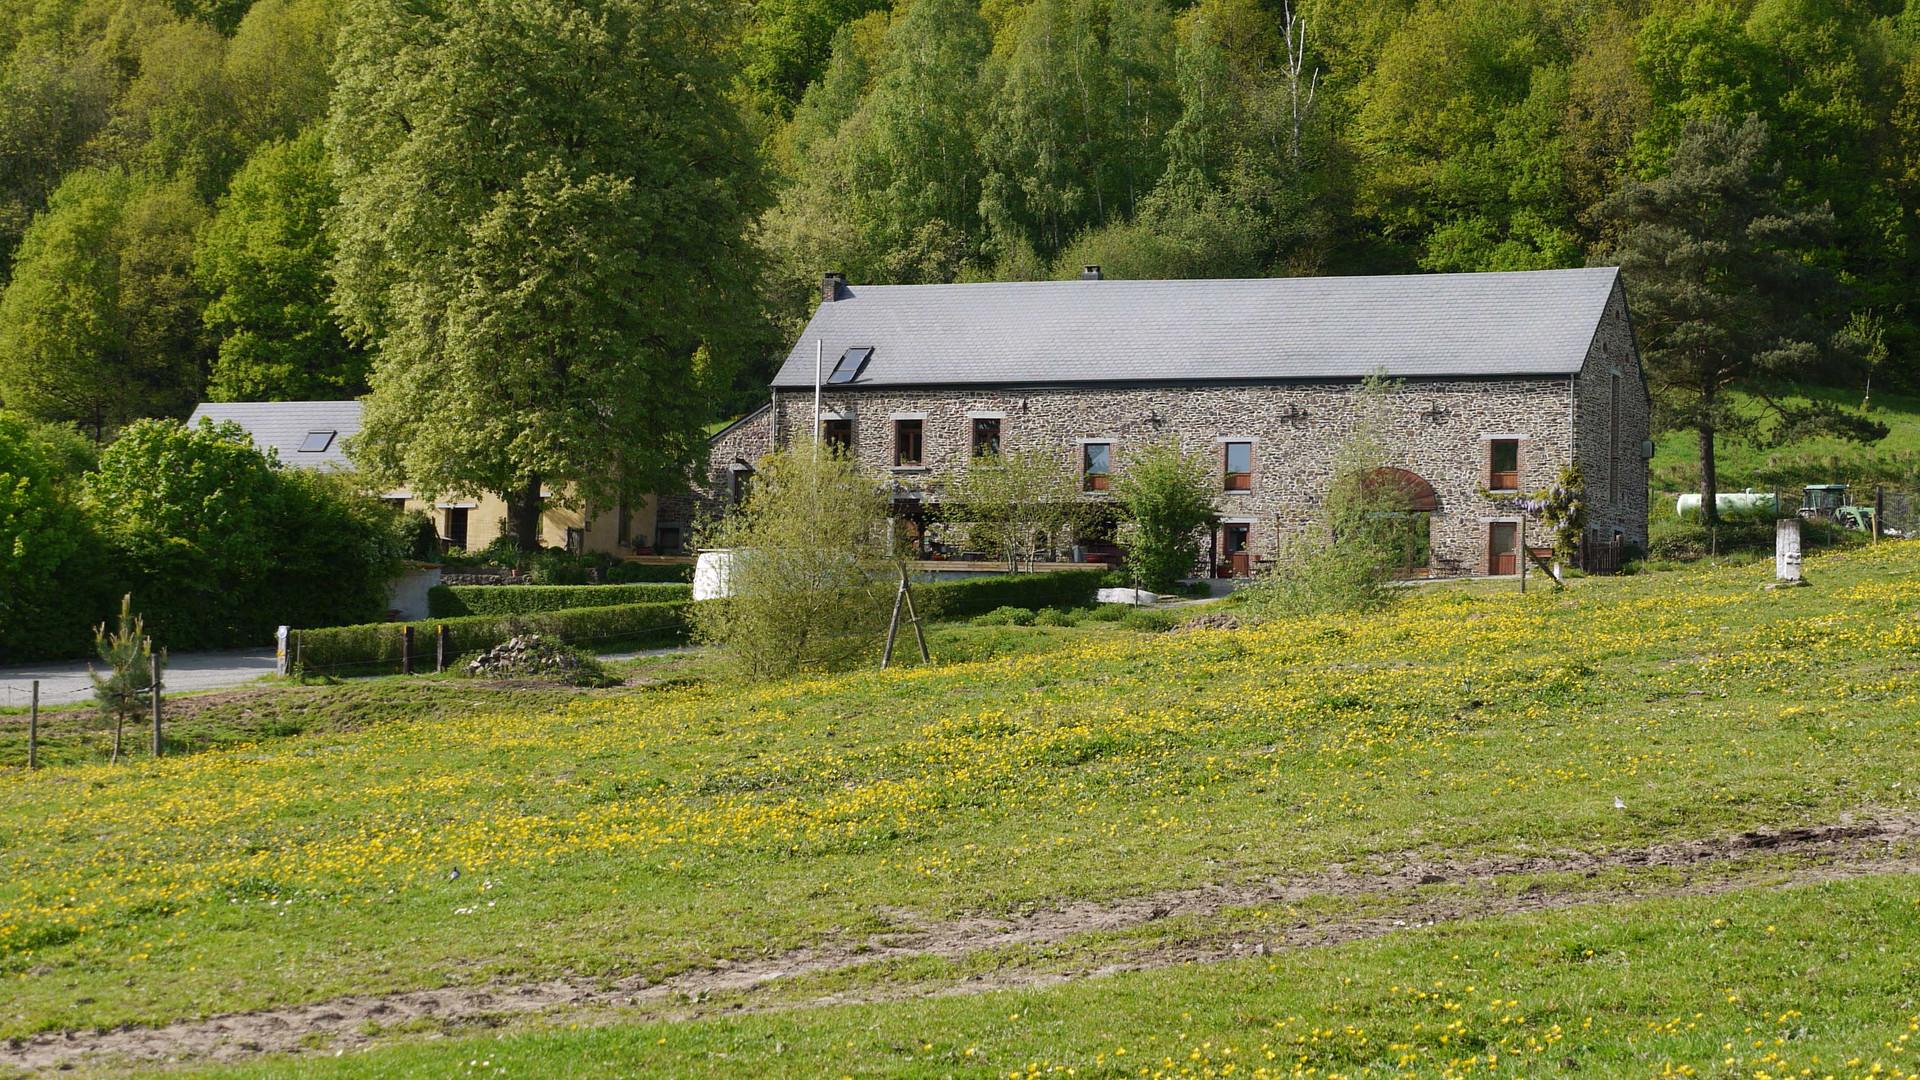 Domaine d'Ahinvaux